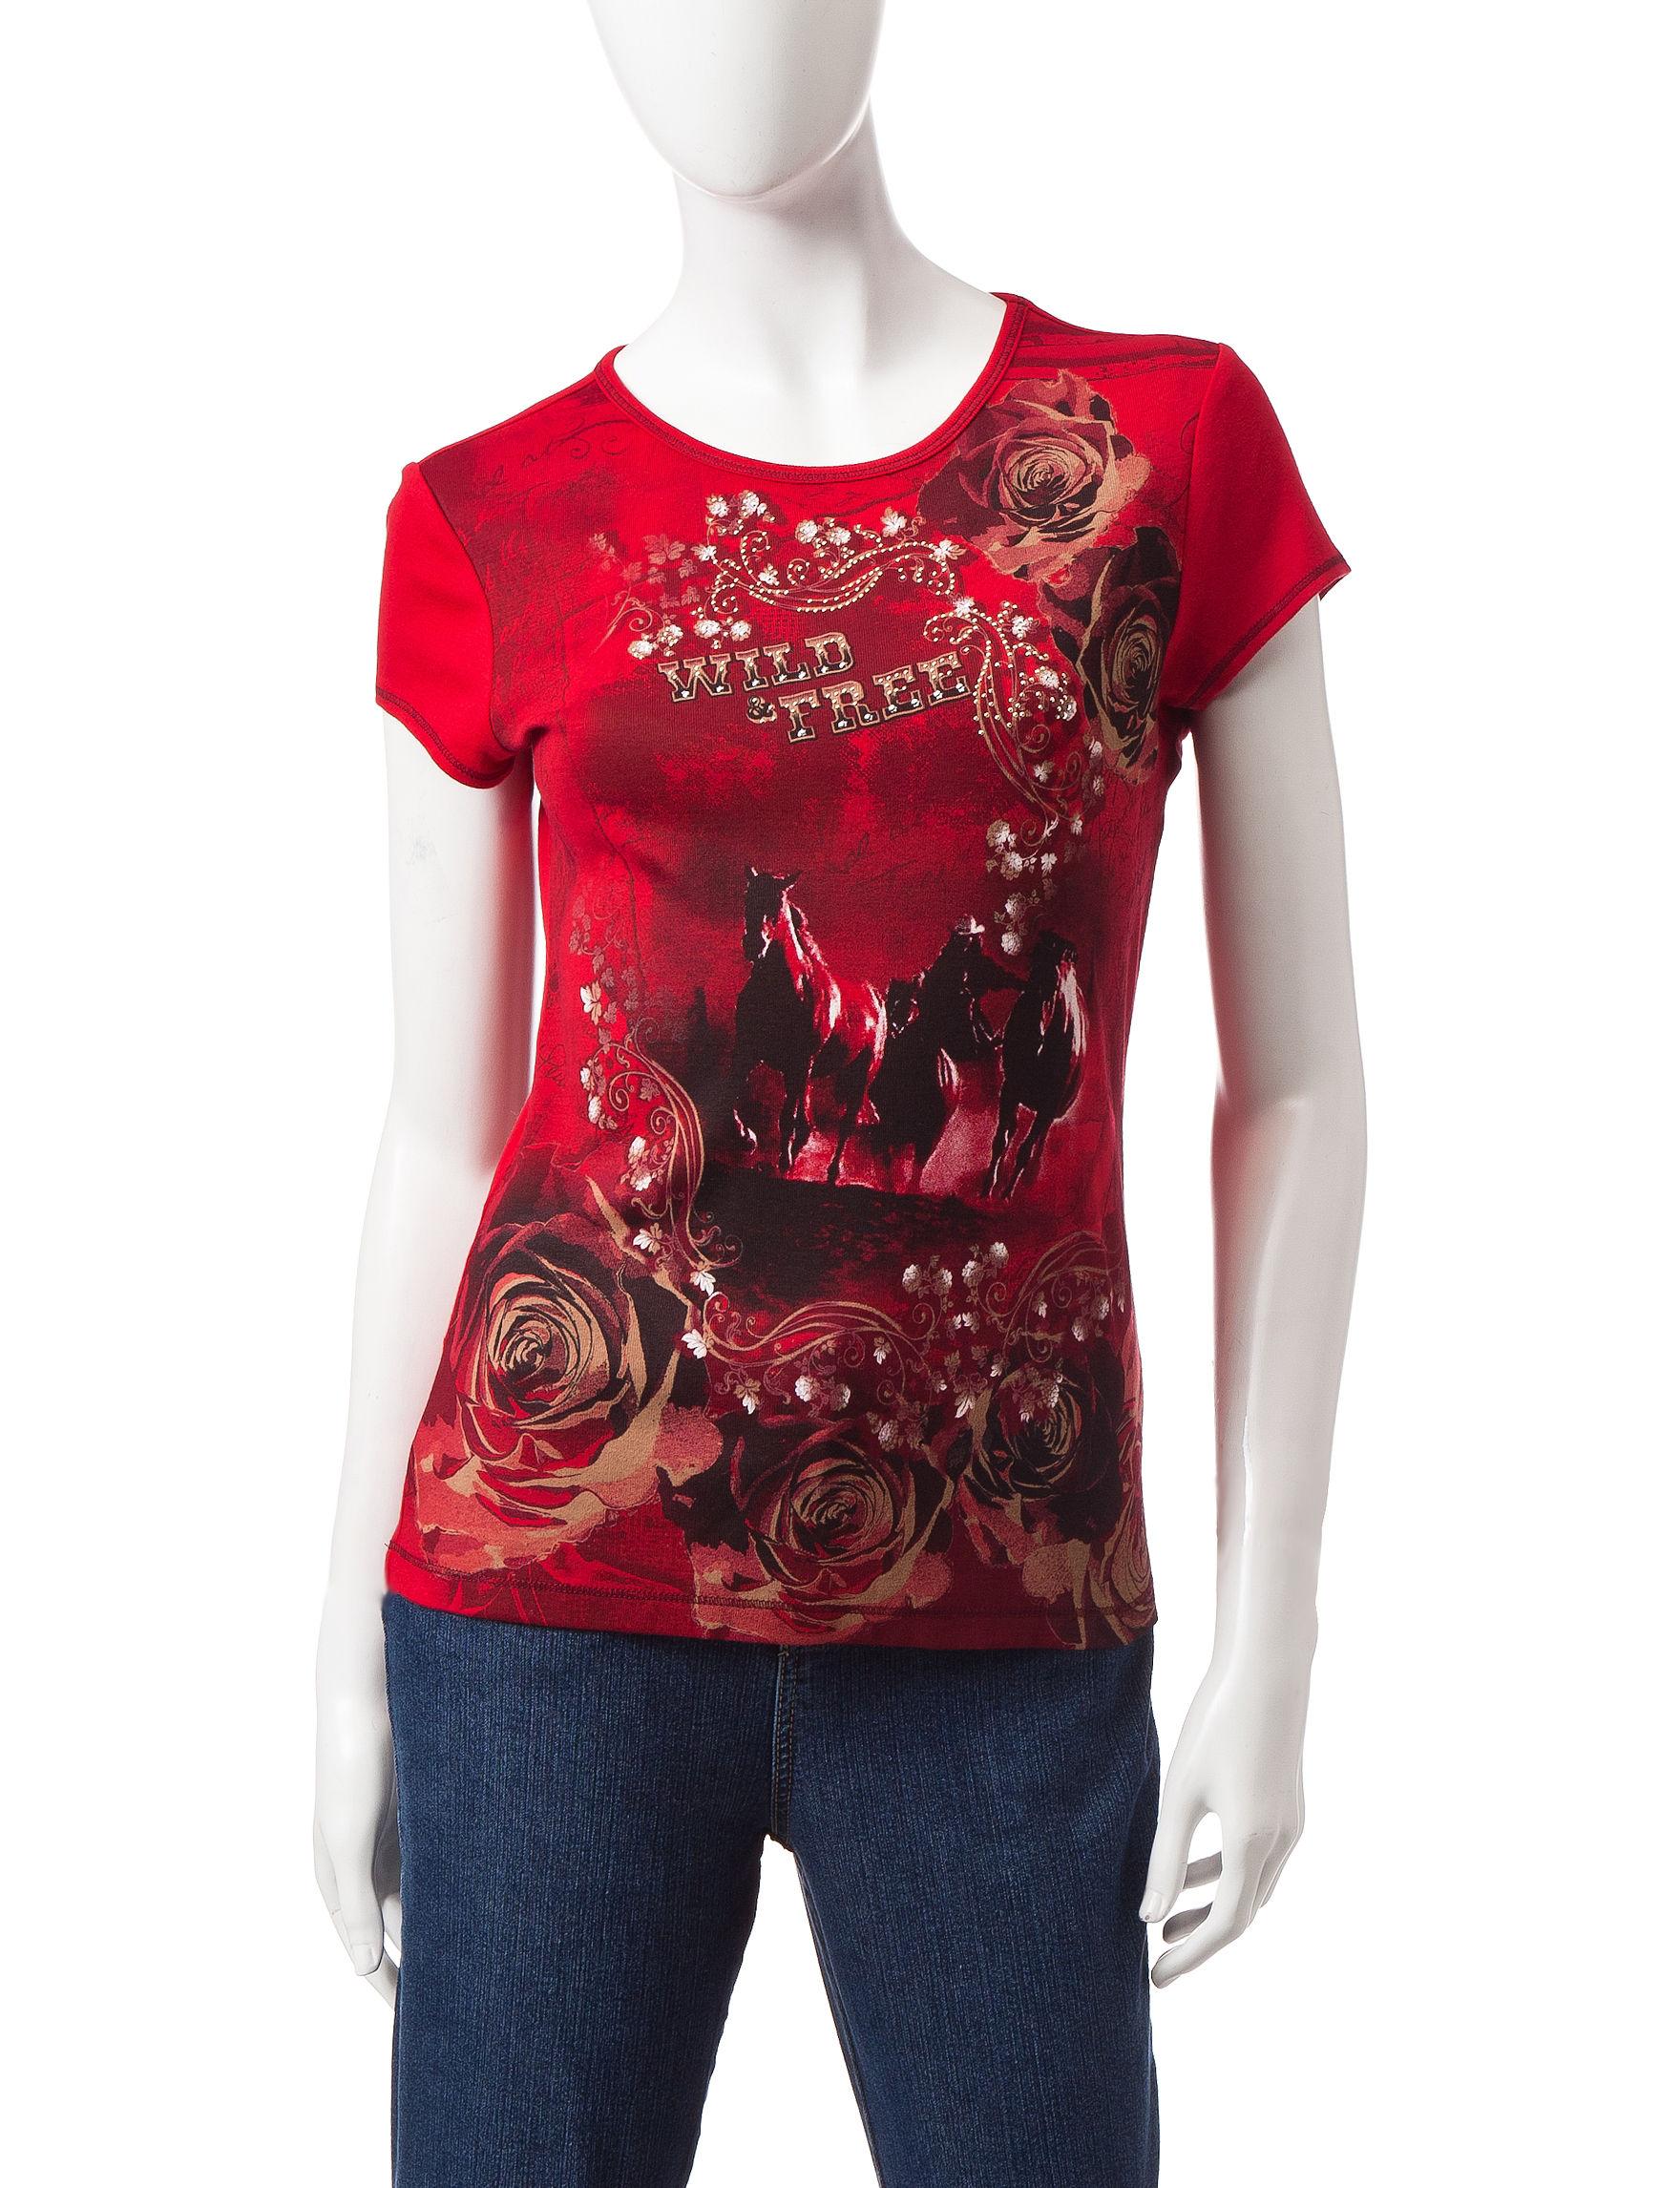 Blue Canyon Red Shirts & Blouses Tees & Tanks